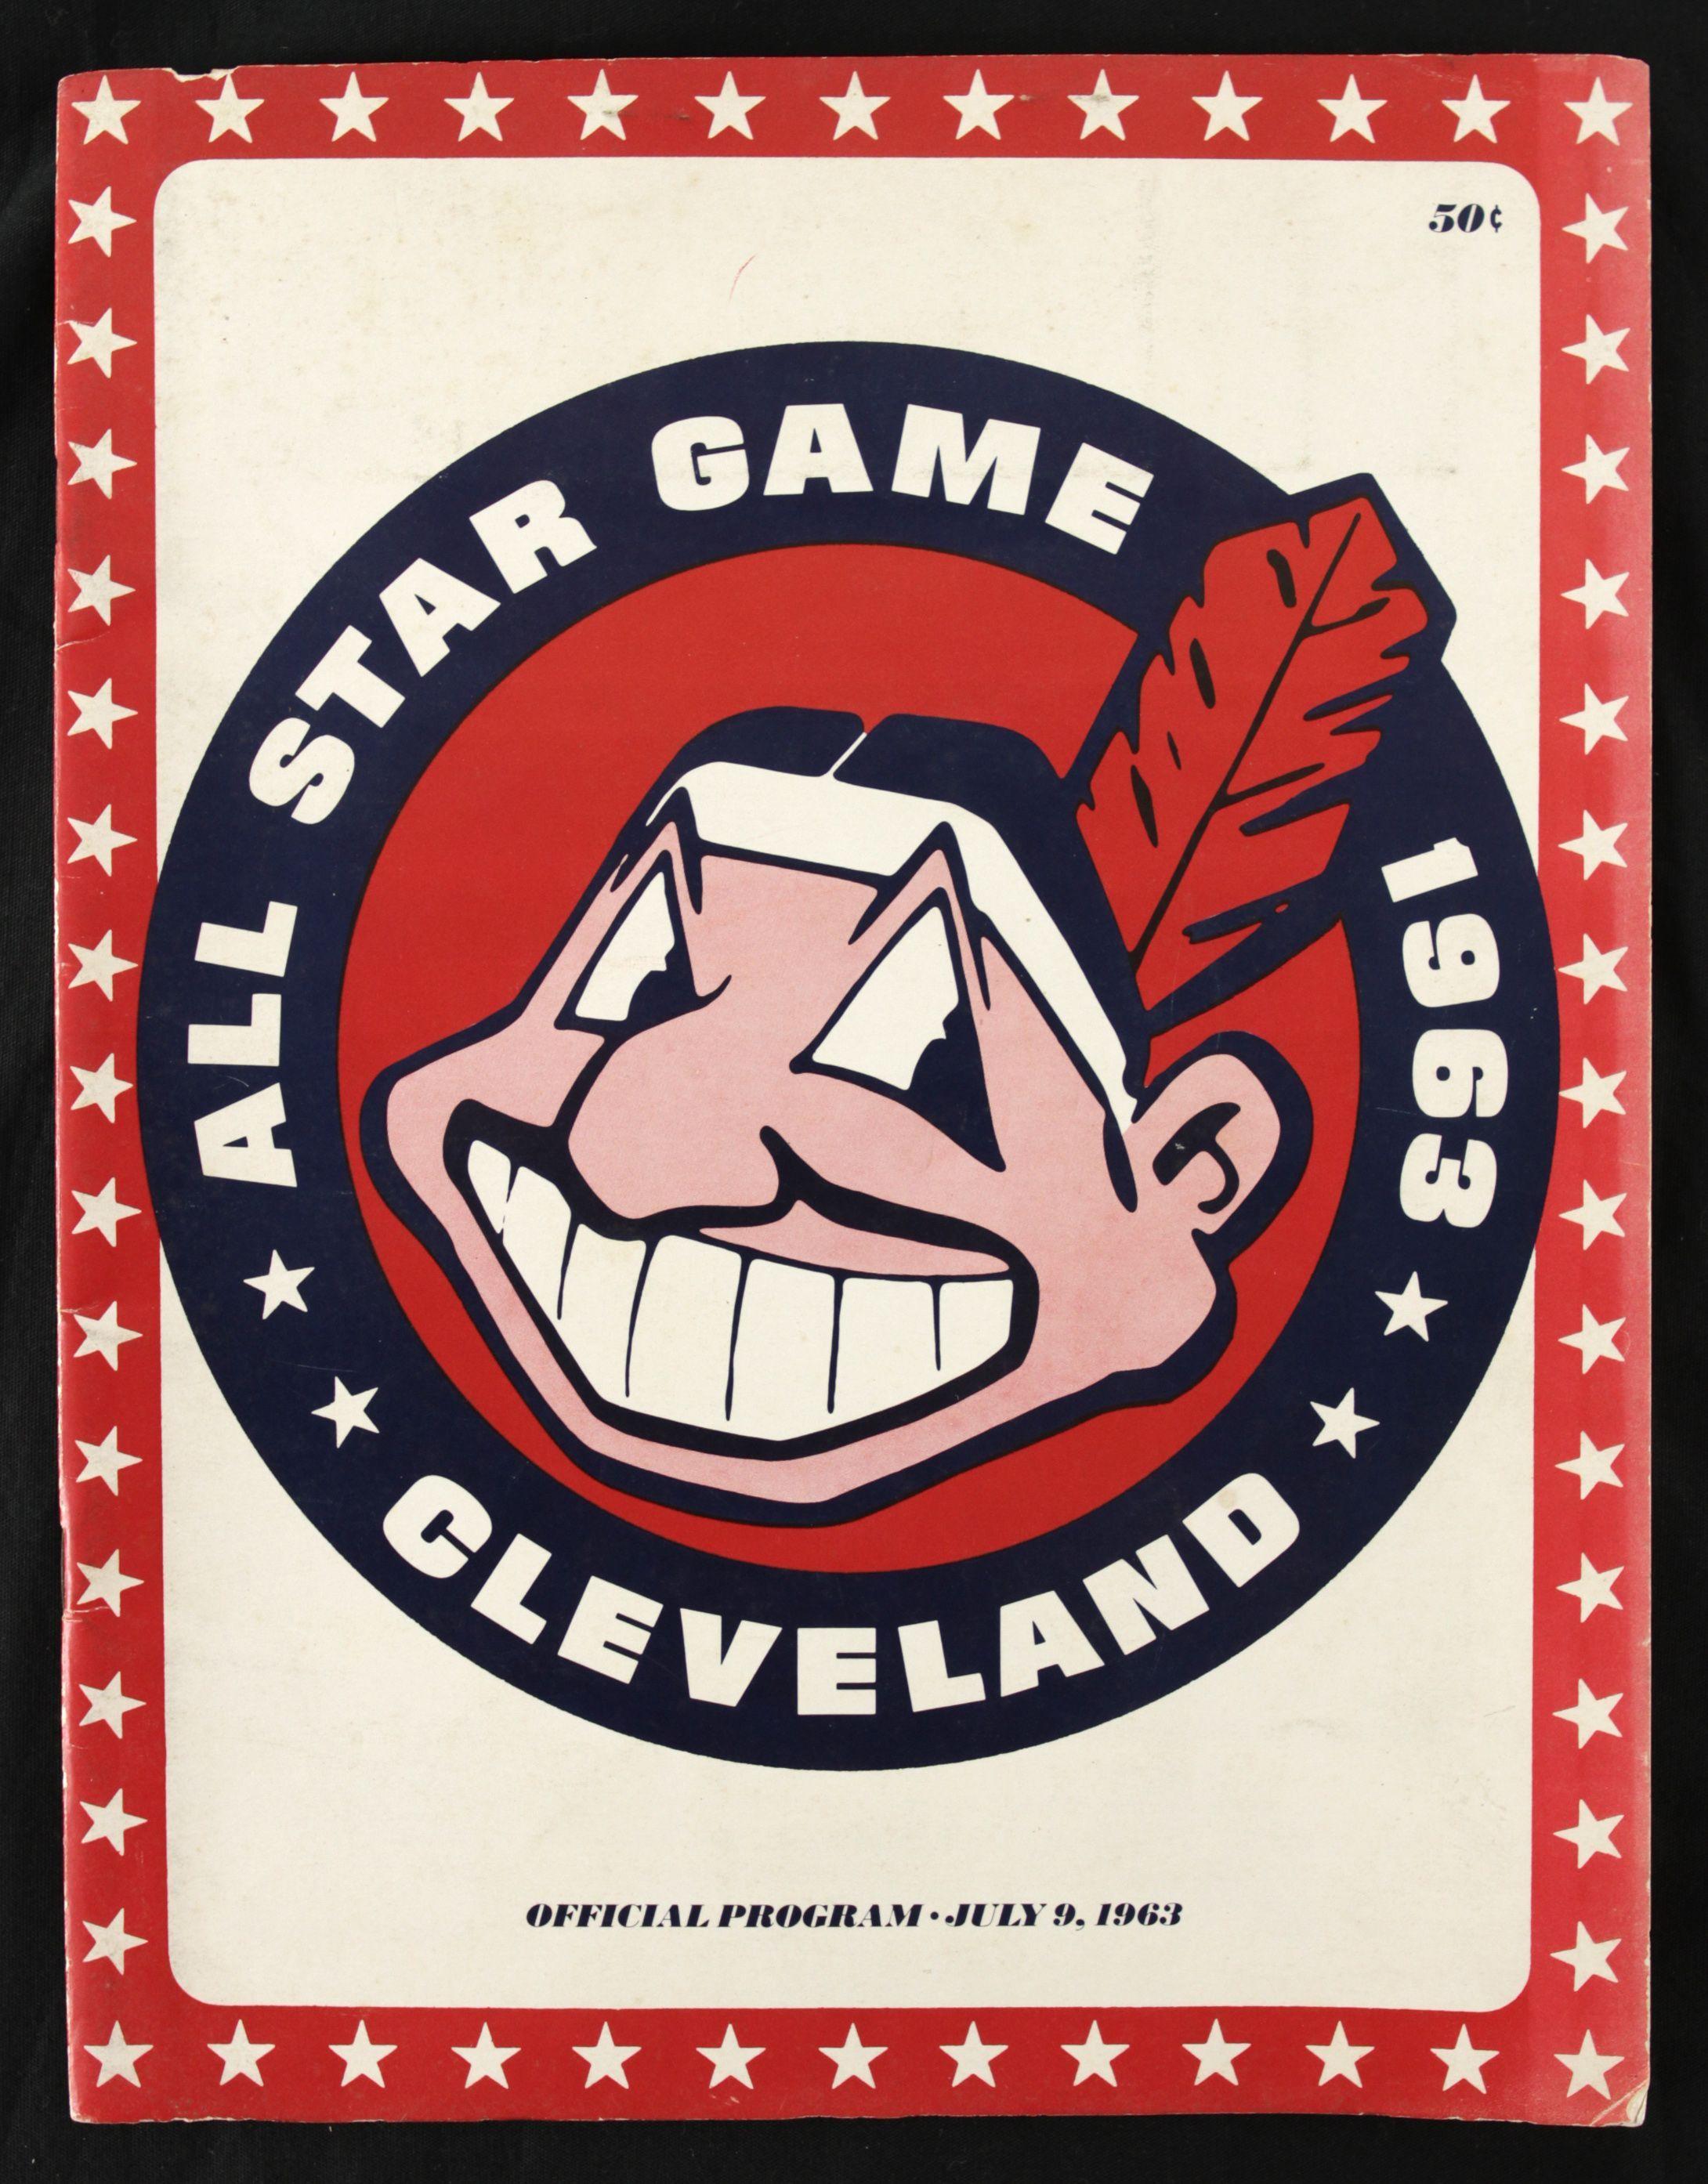 1963 All Star Game Yearbook Baseball posters, Baseball